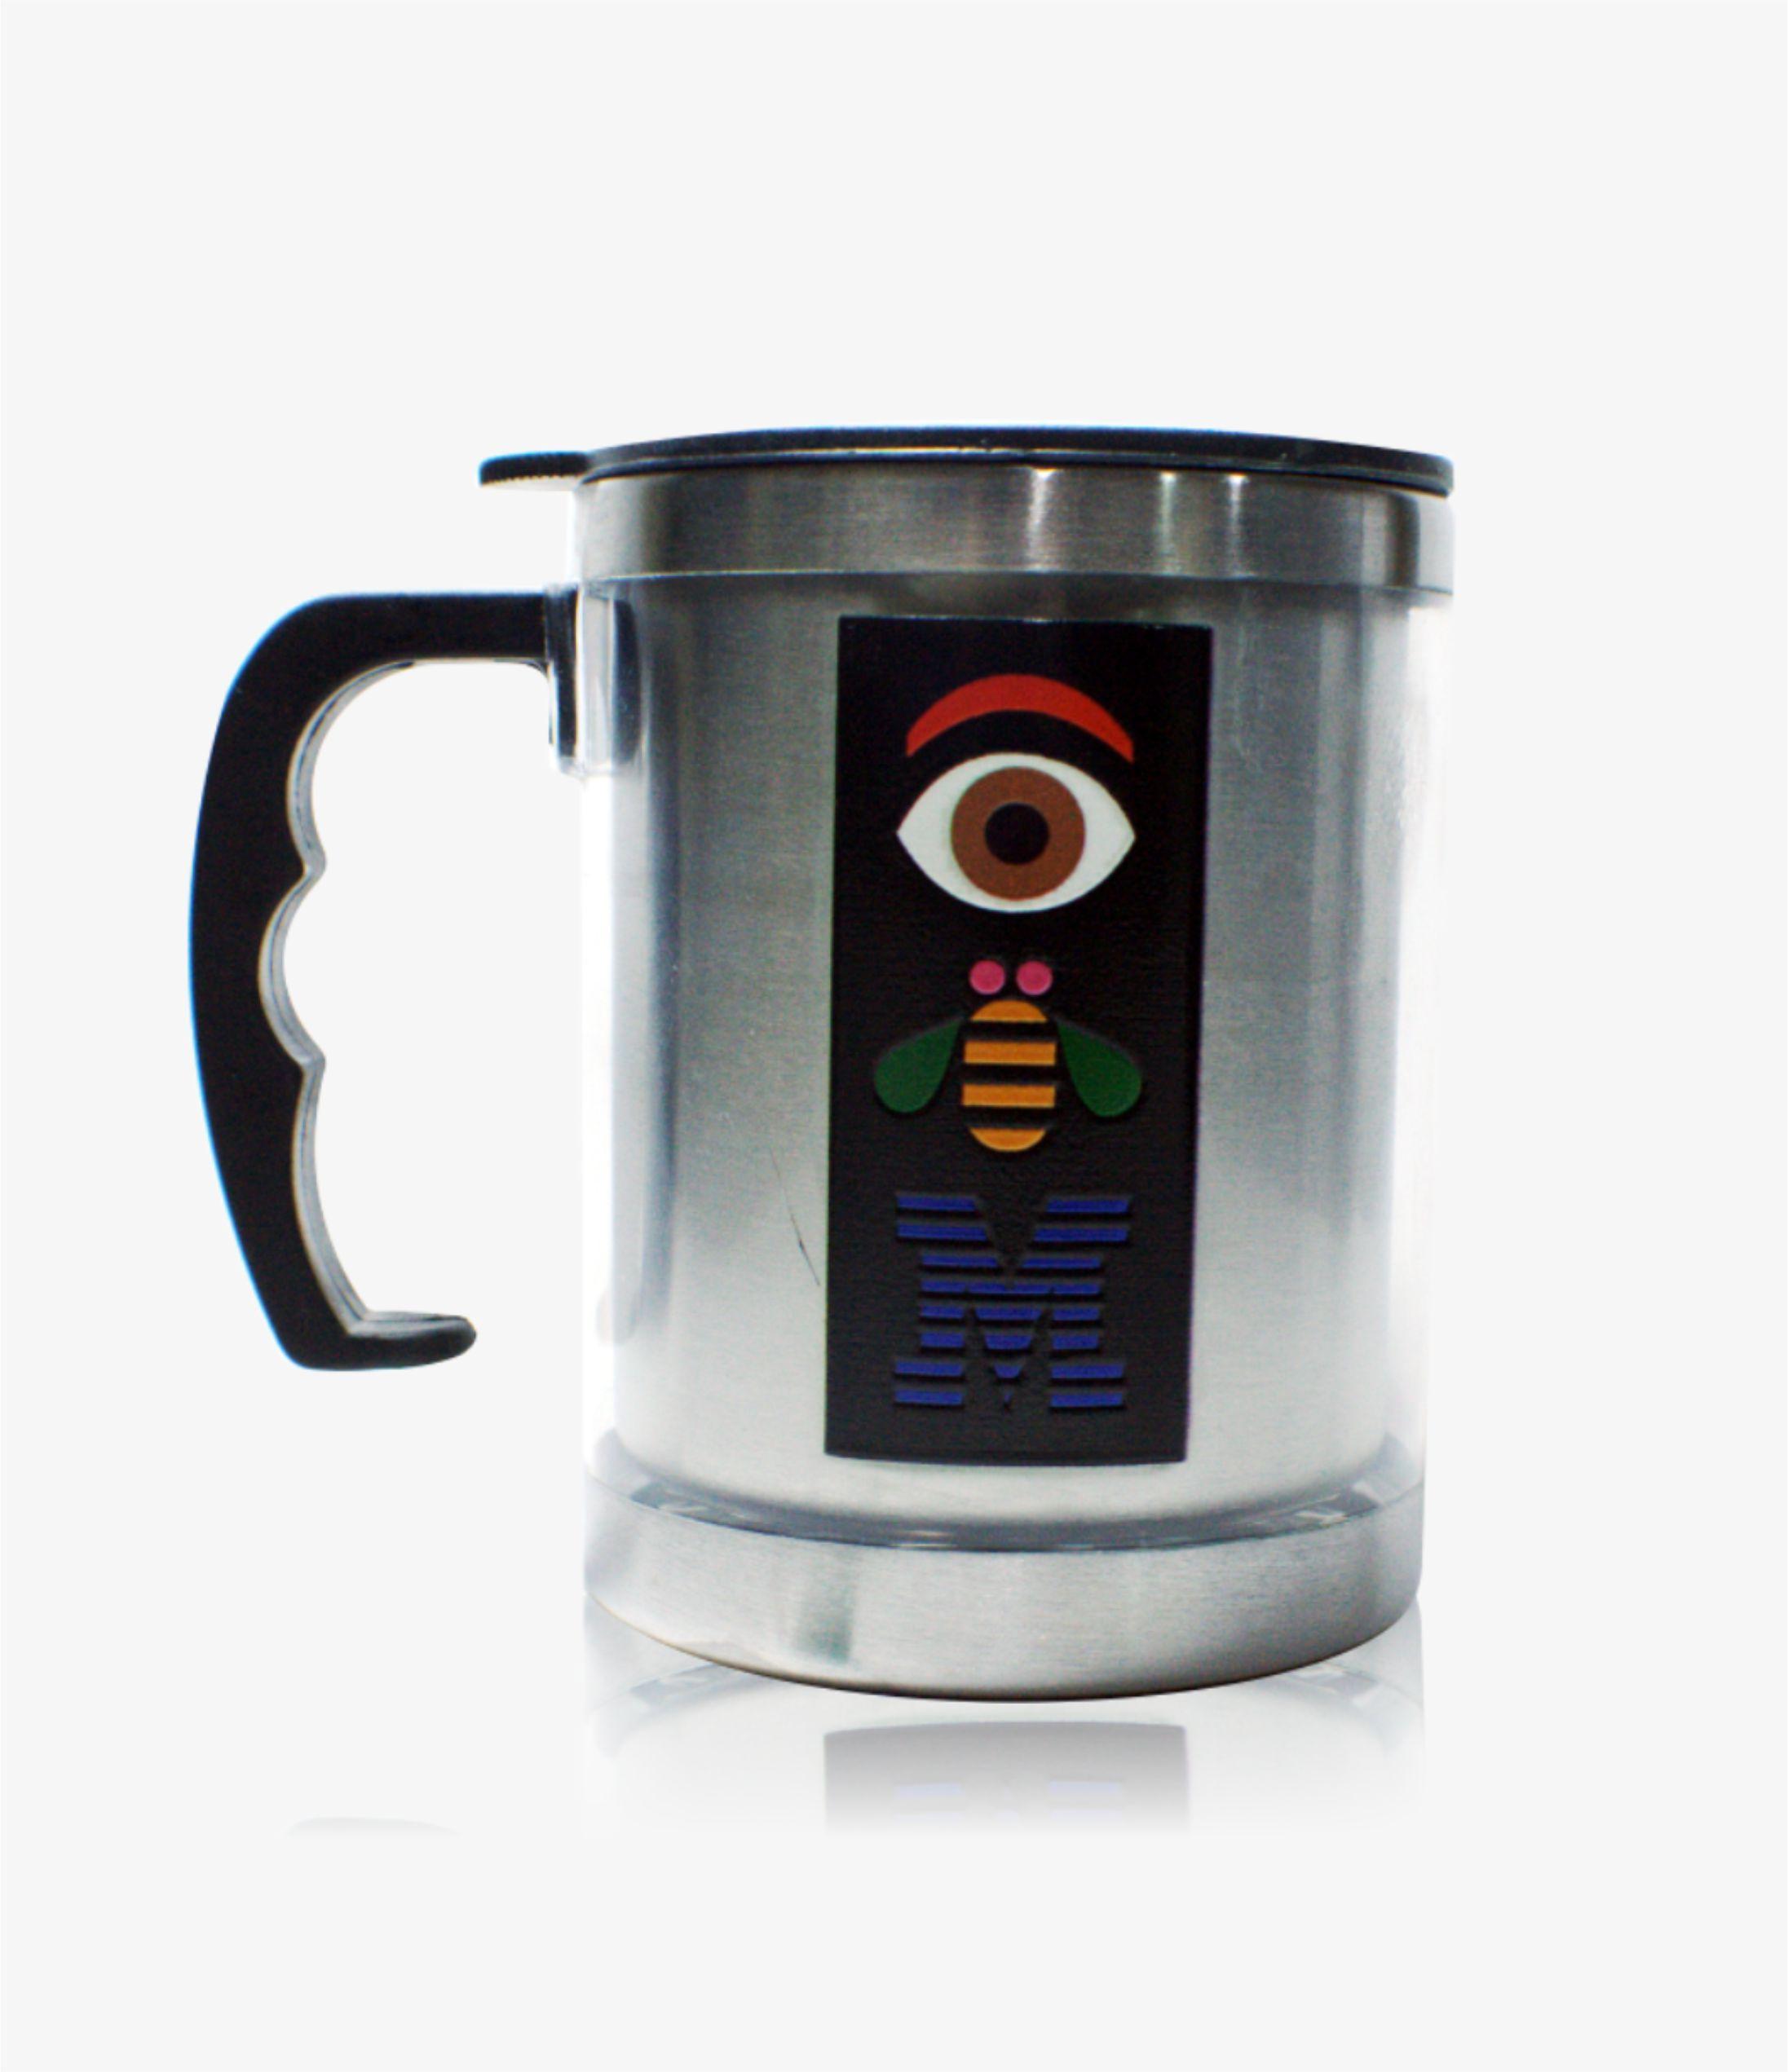 Custom Printed Stainless Mug